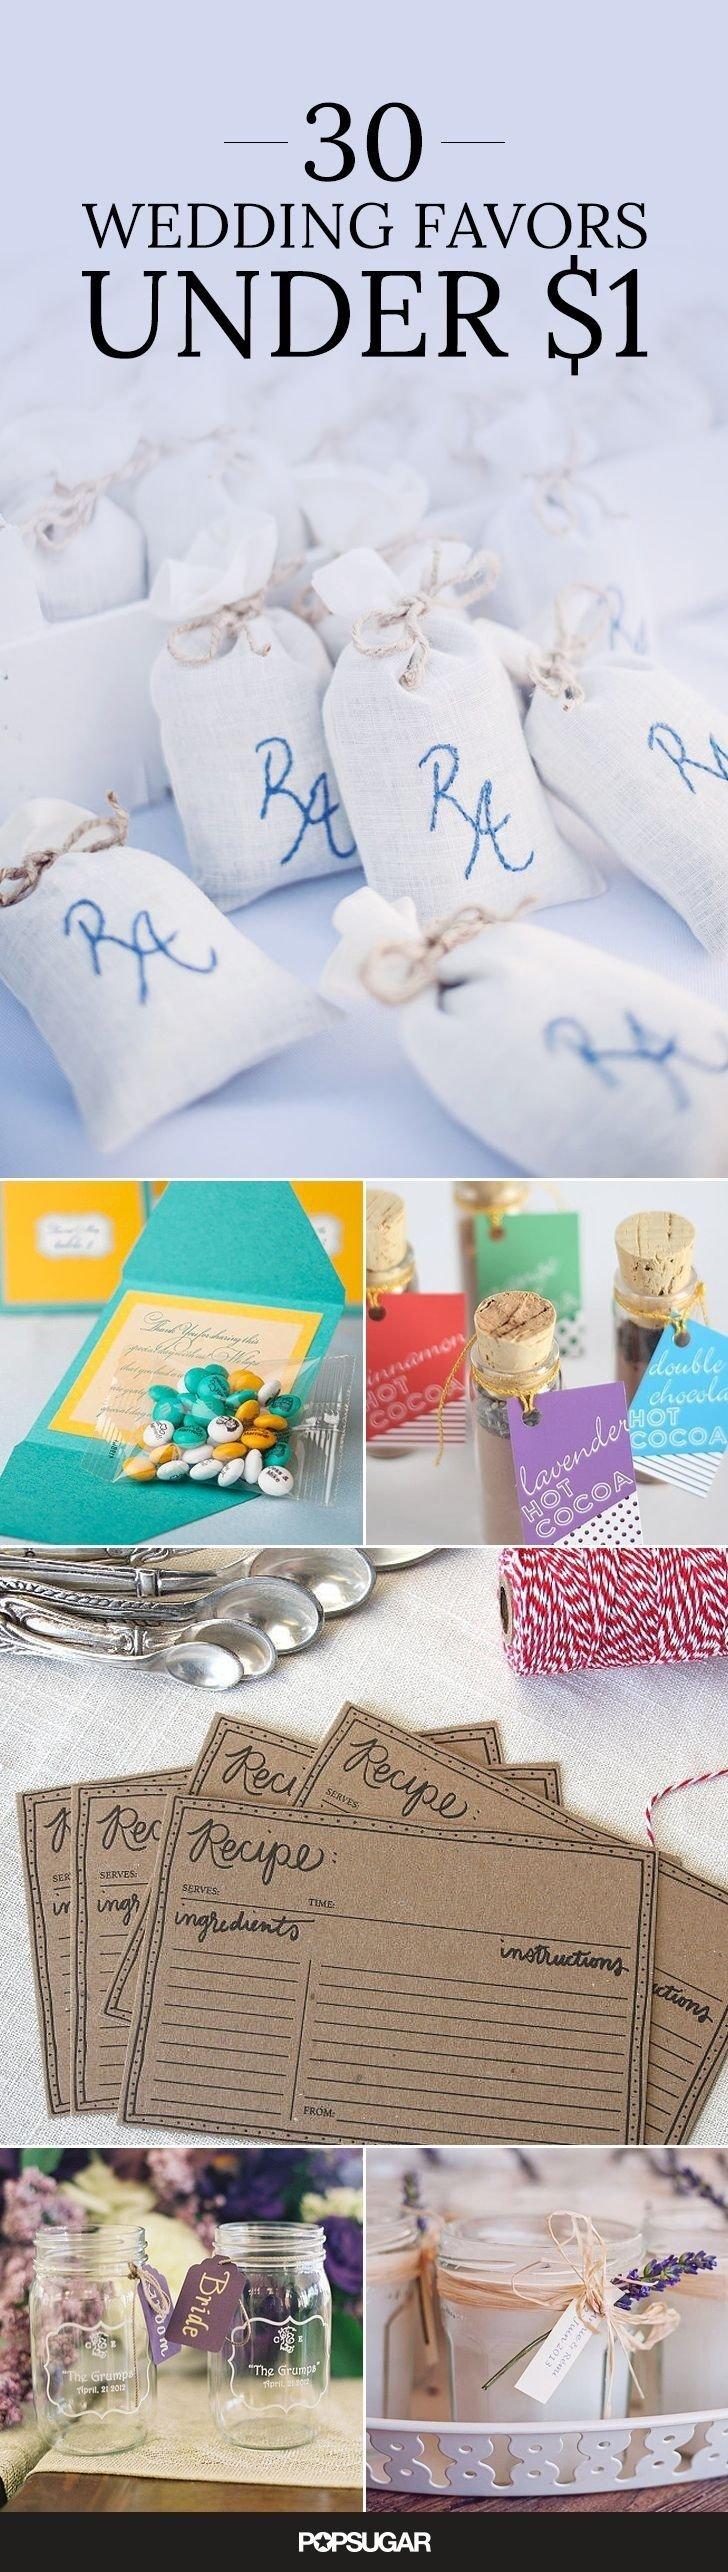 10 Pretty Creative Wedding Ideas On A Budget 15 best budget wedding planning images on pinterest wedding ideas 2020